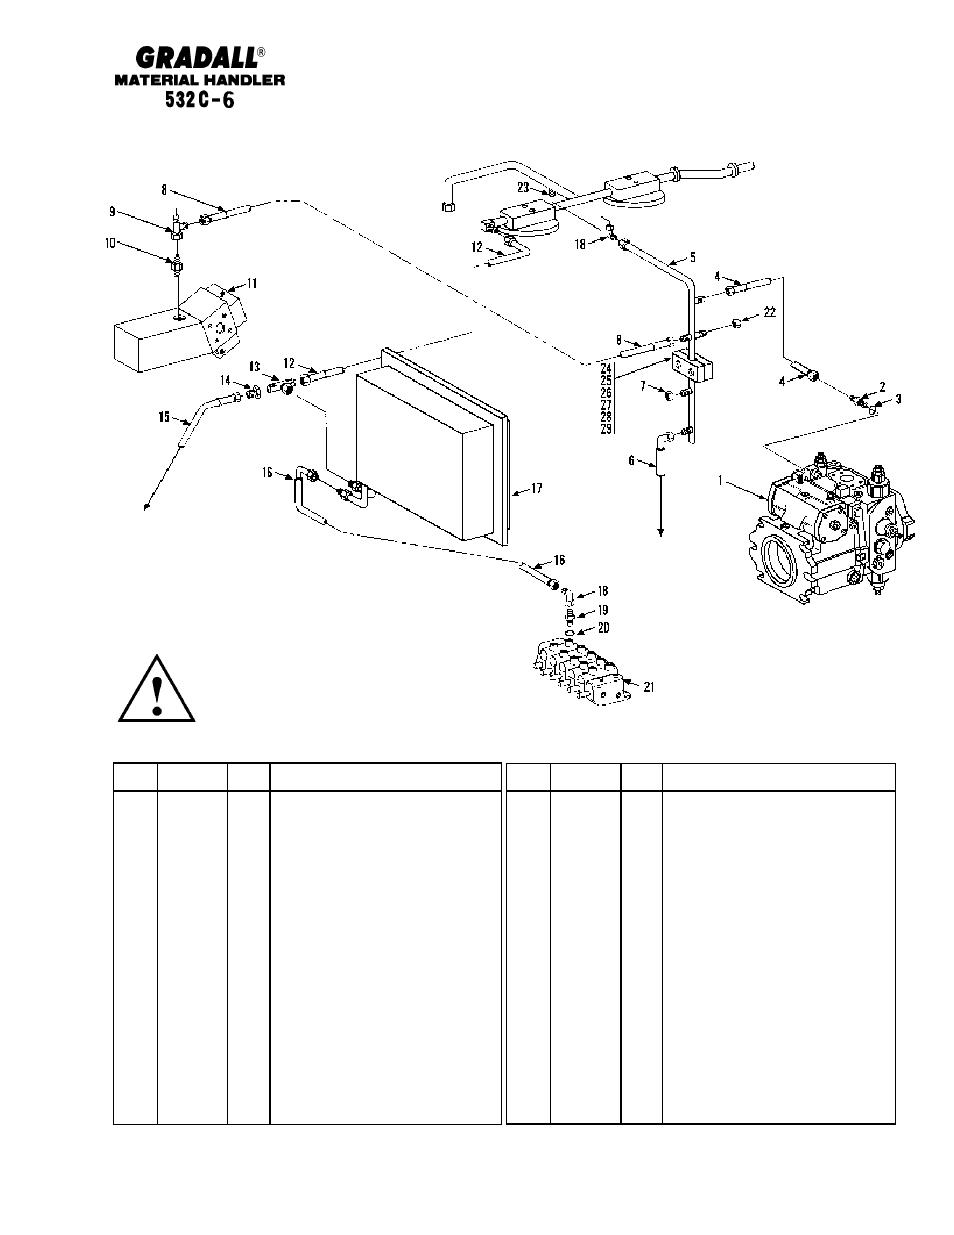 Hydraulic Circuits Dump Circuit 532c 6 Gradall 534c Parts System Diagram Serial Numbers Manual User Page 167 380